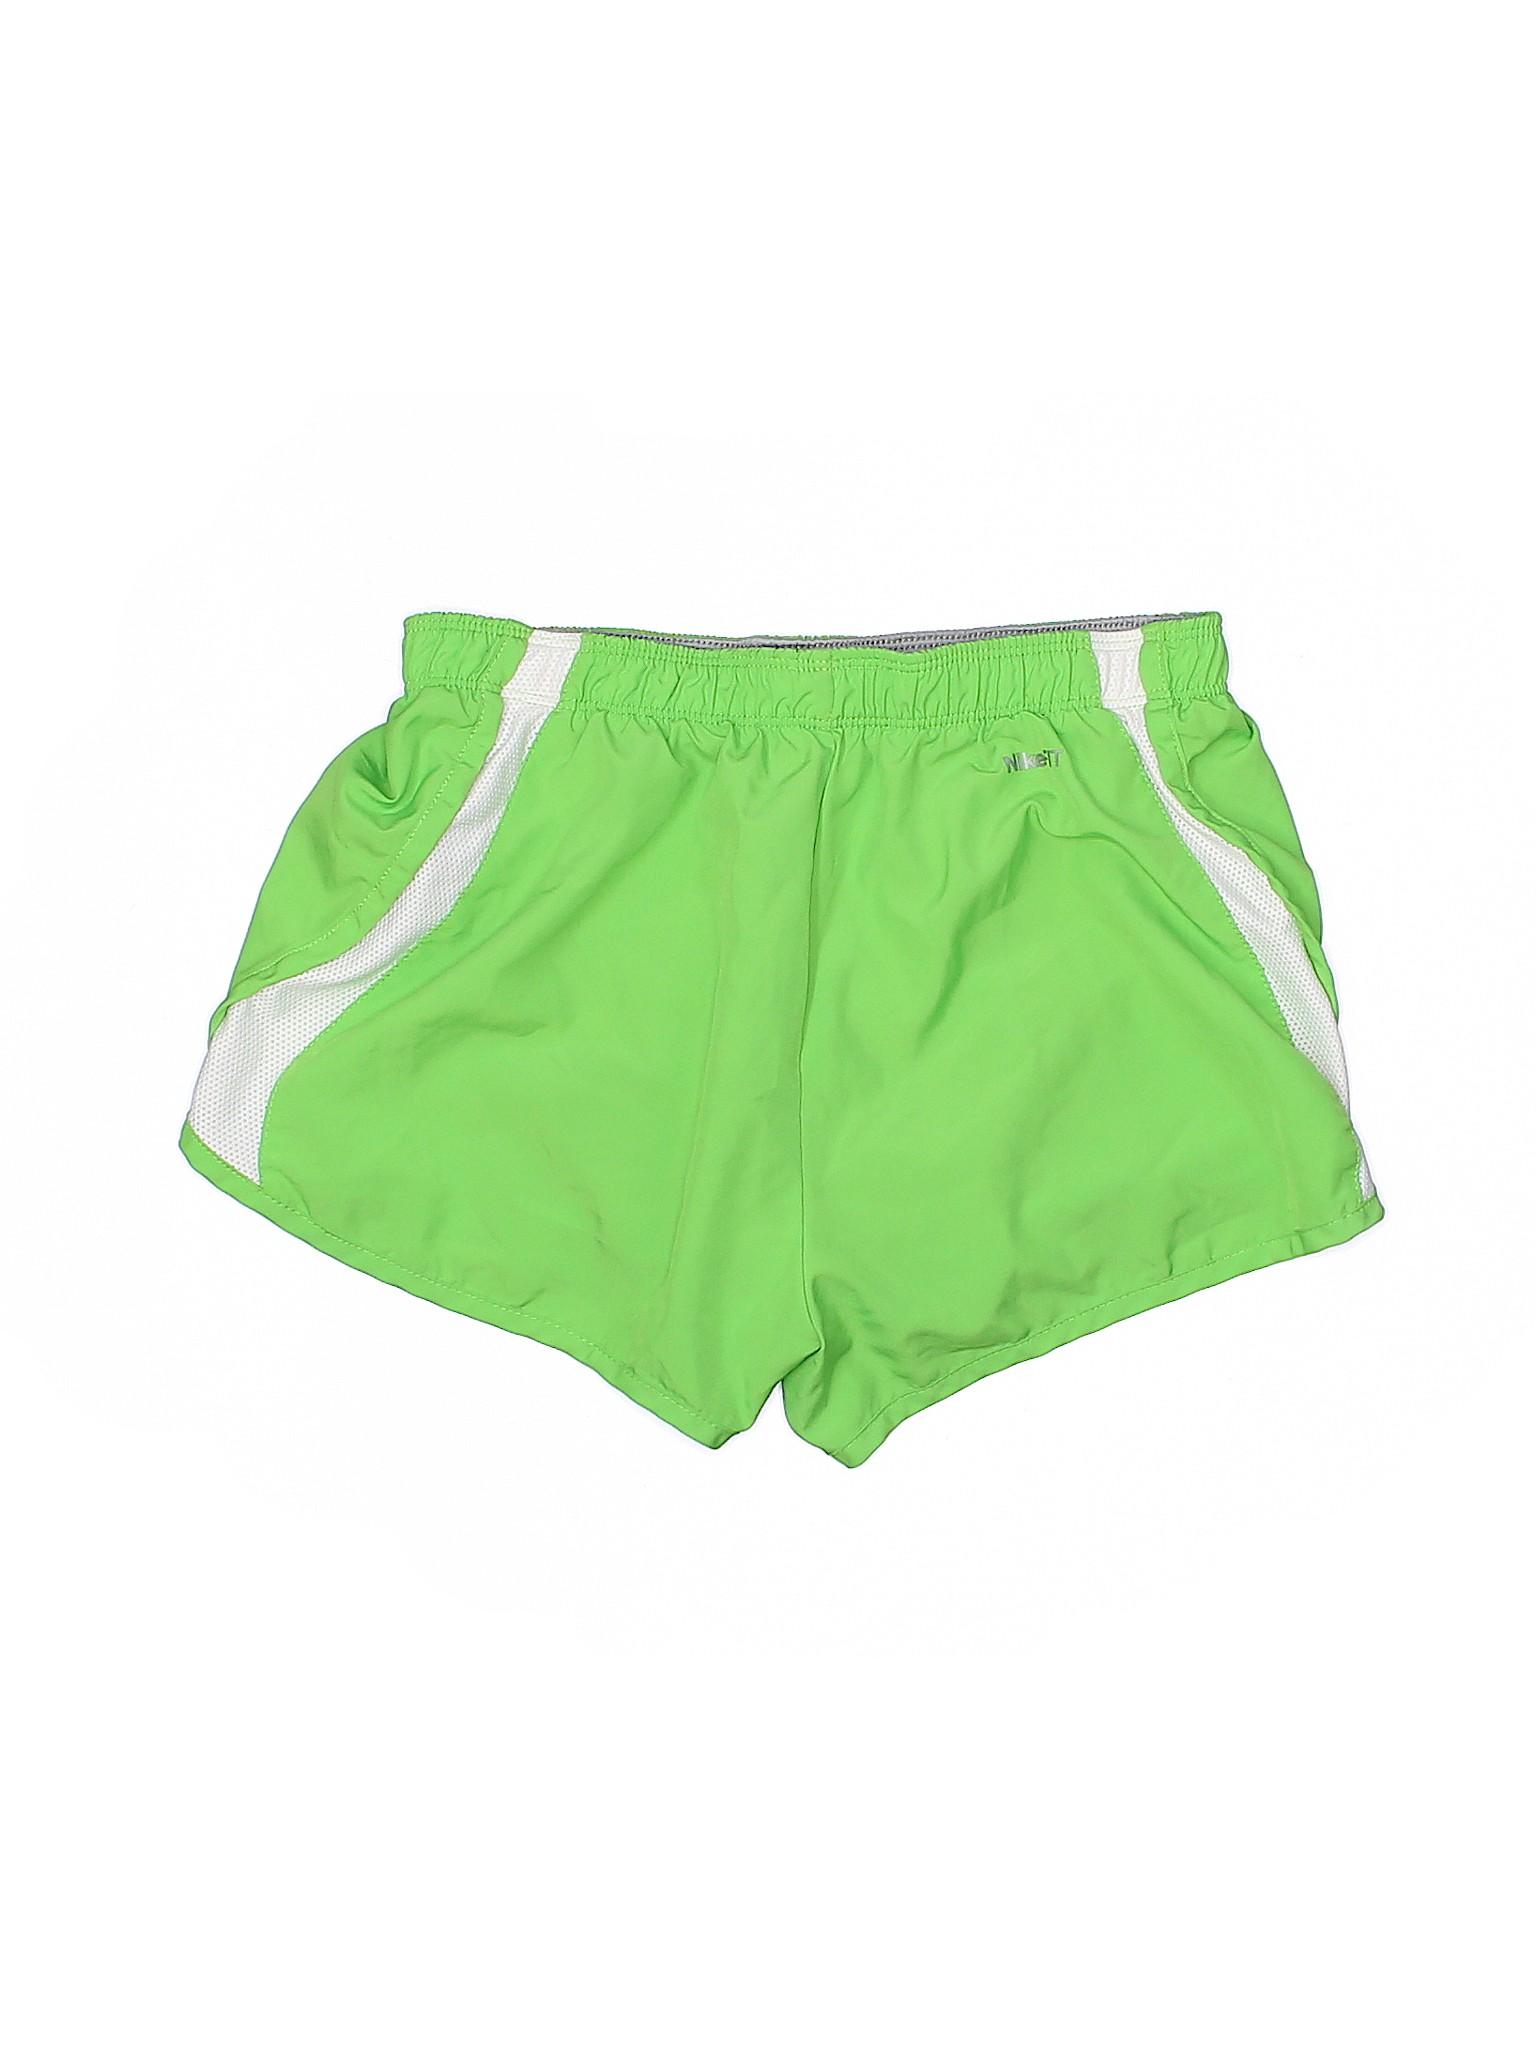 Boutique Athletic Nike Athletic Athletic Boutique Shorts Nike Shorts Boutique Nike 1YBZZq